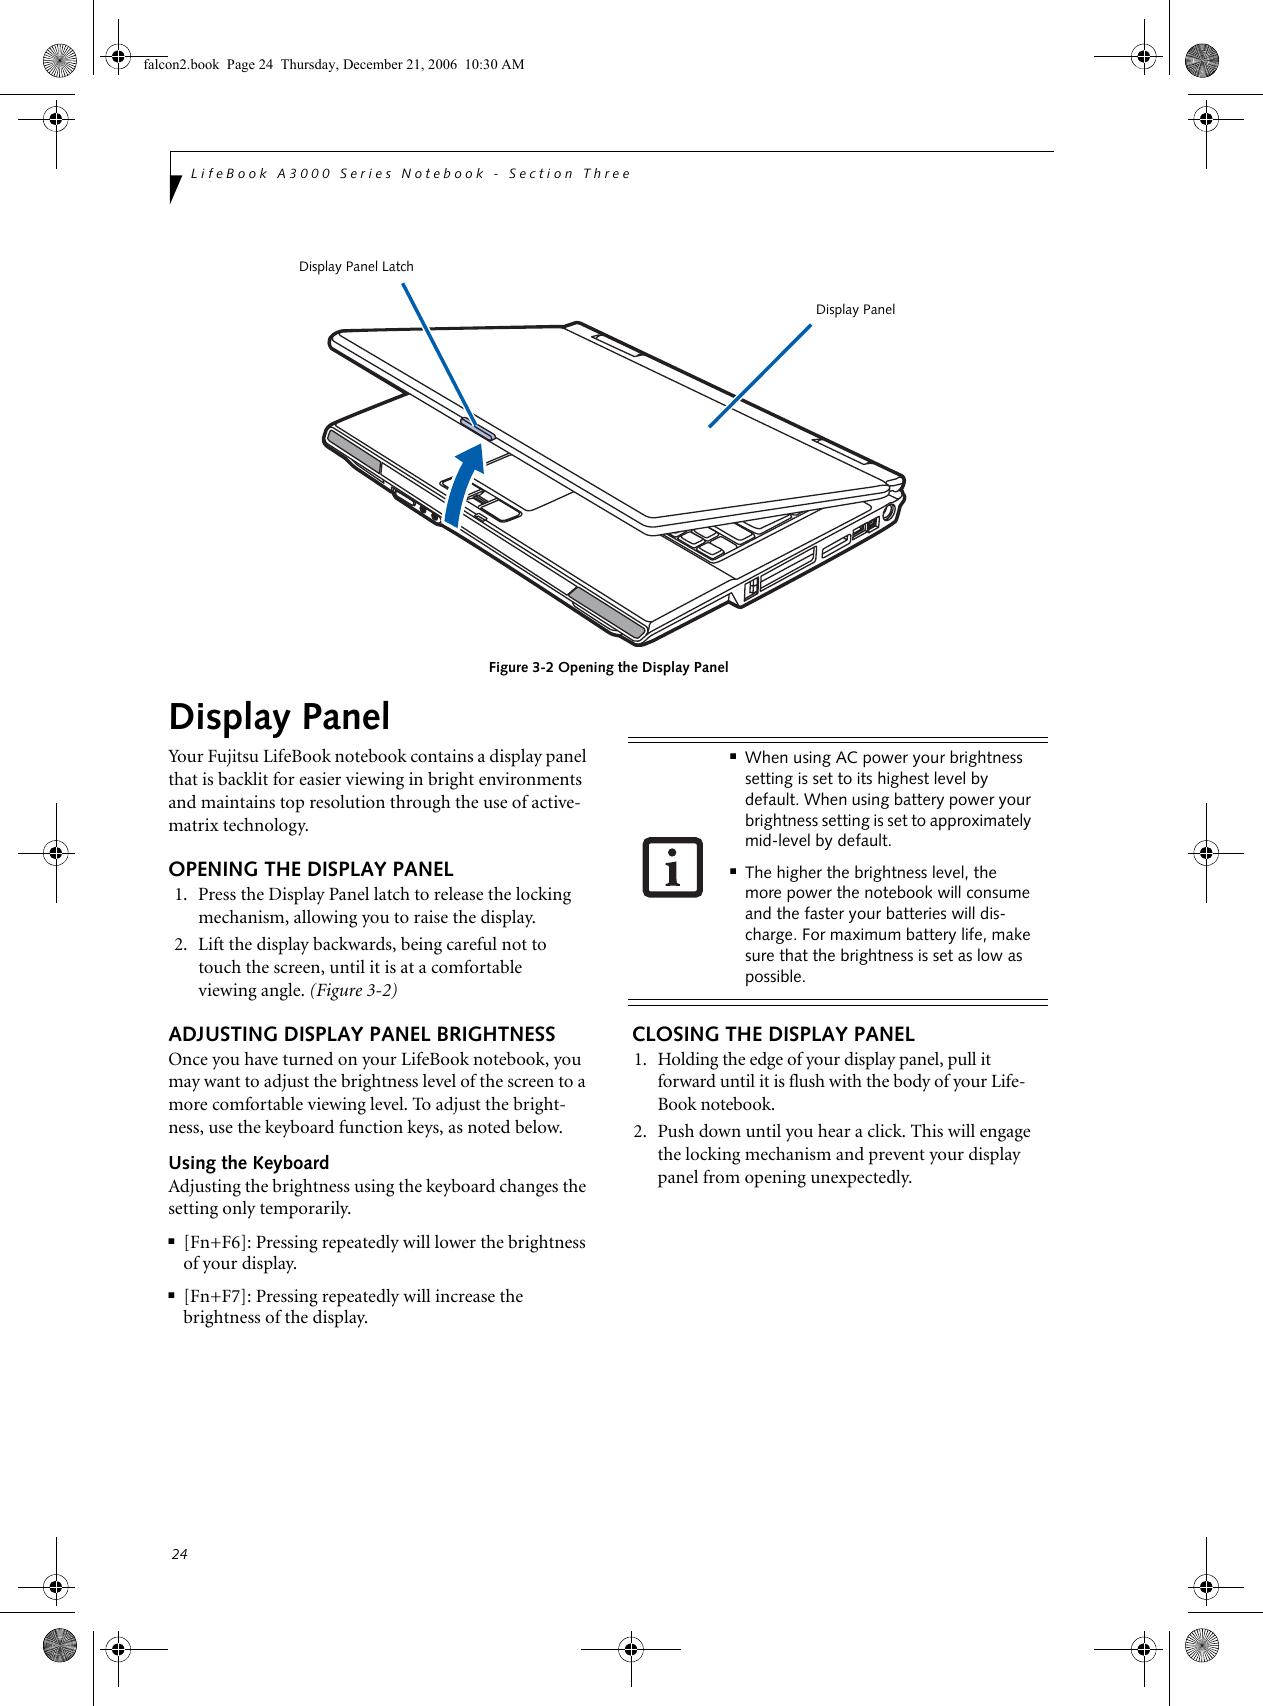 Fujitsu Siemens Computers Lifebook A3120 Users Manual Falcon2